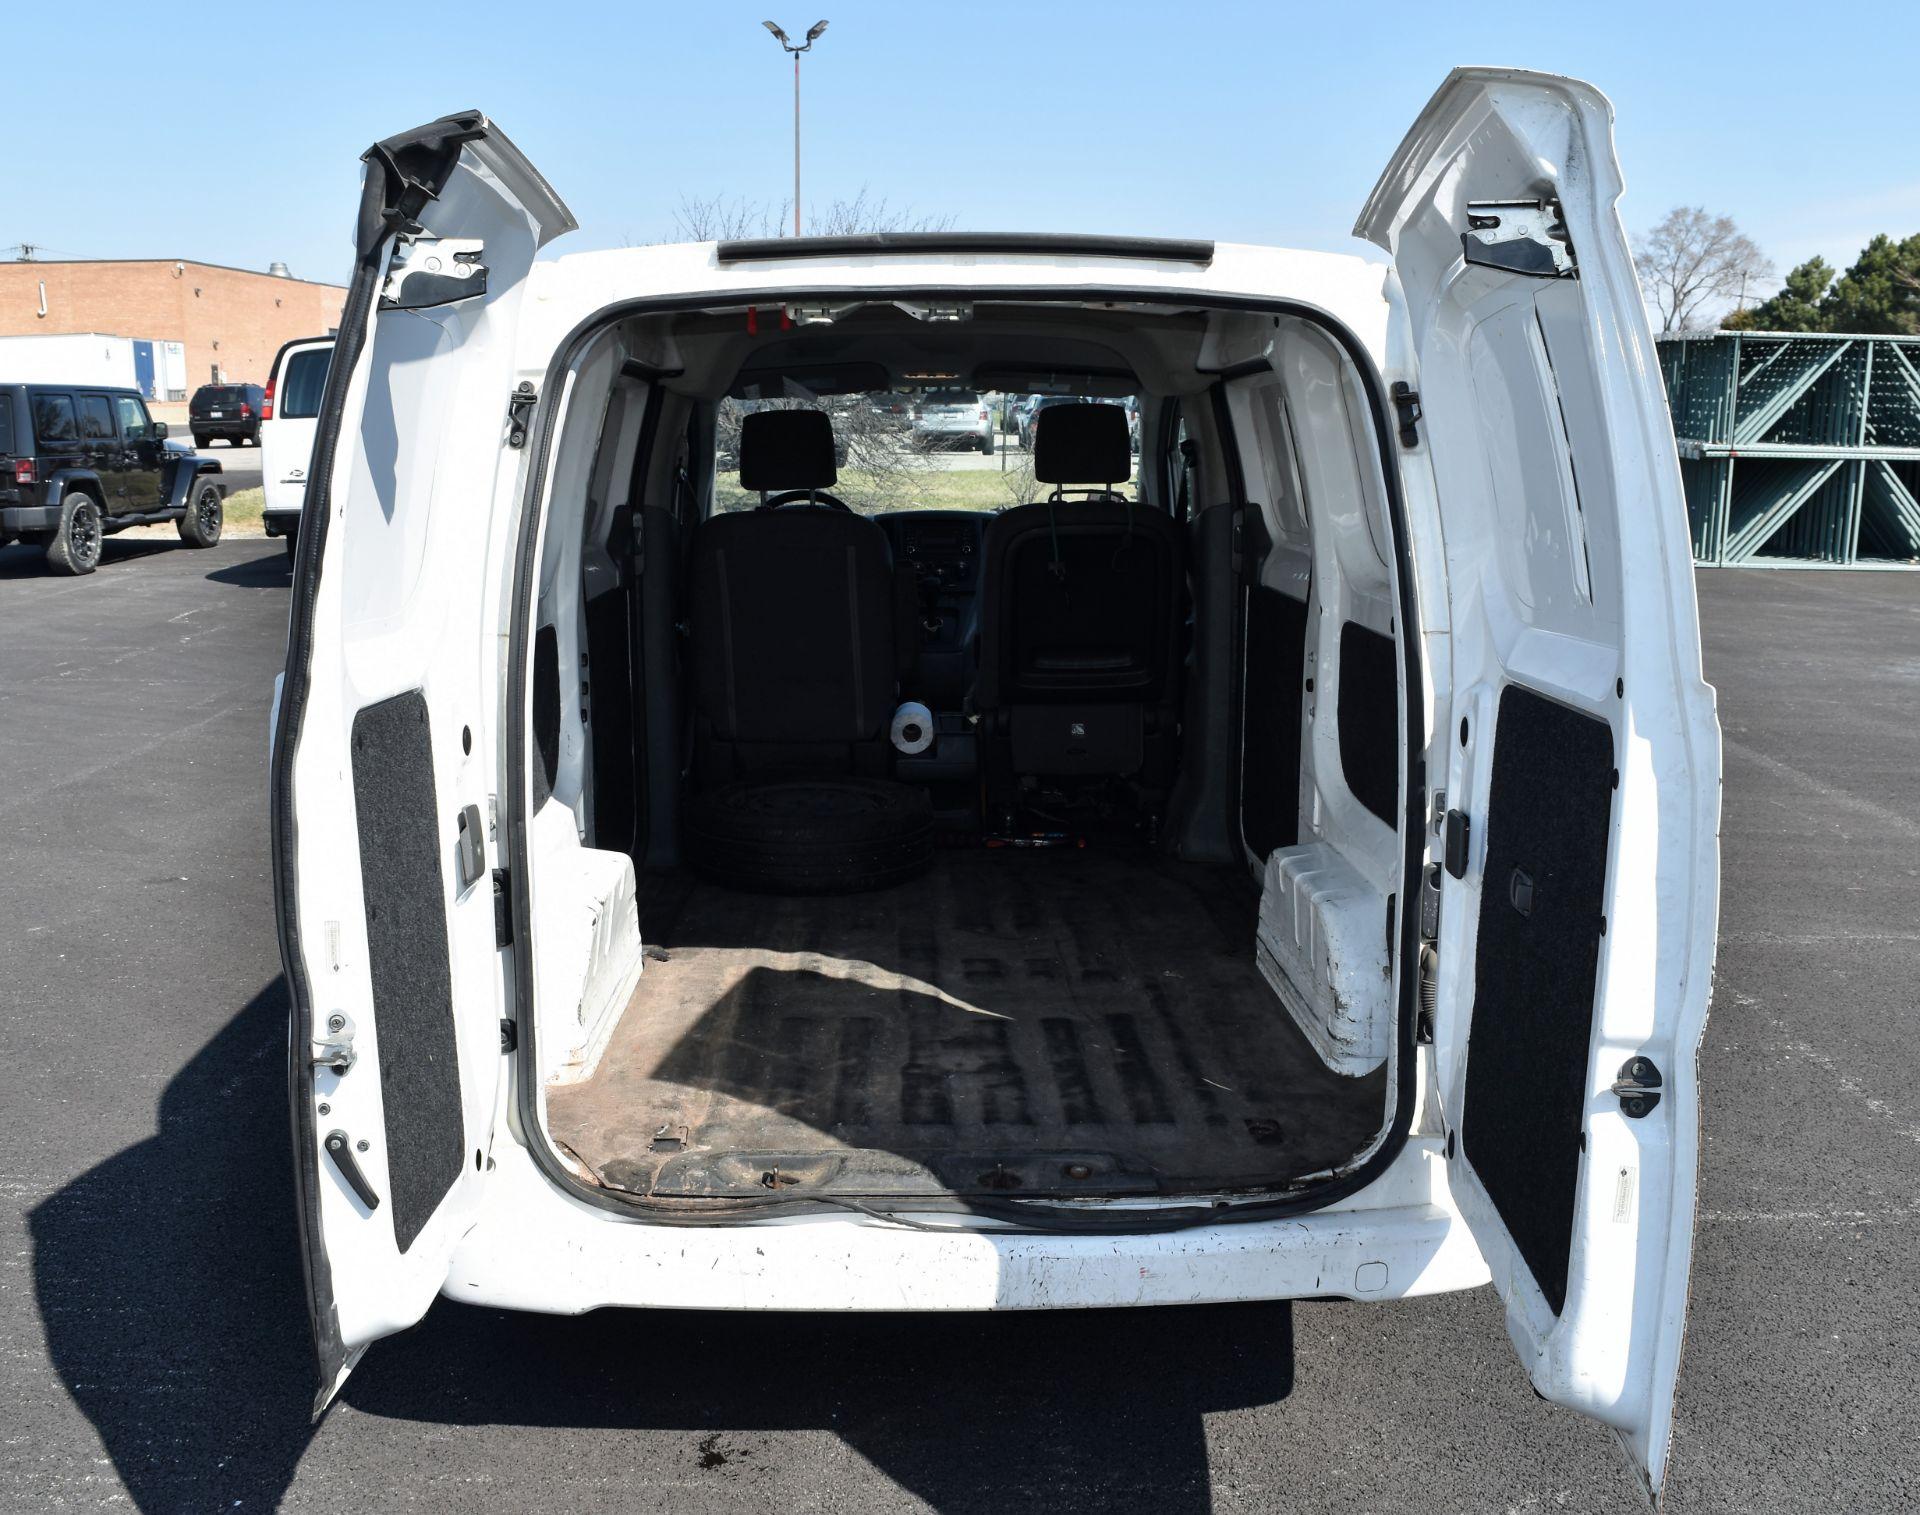 2013 Nissan NV200 Delivery Van - Image 41 of 54